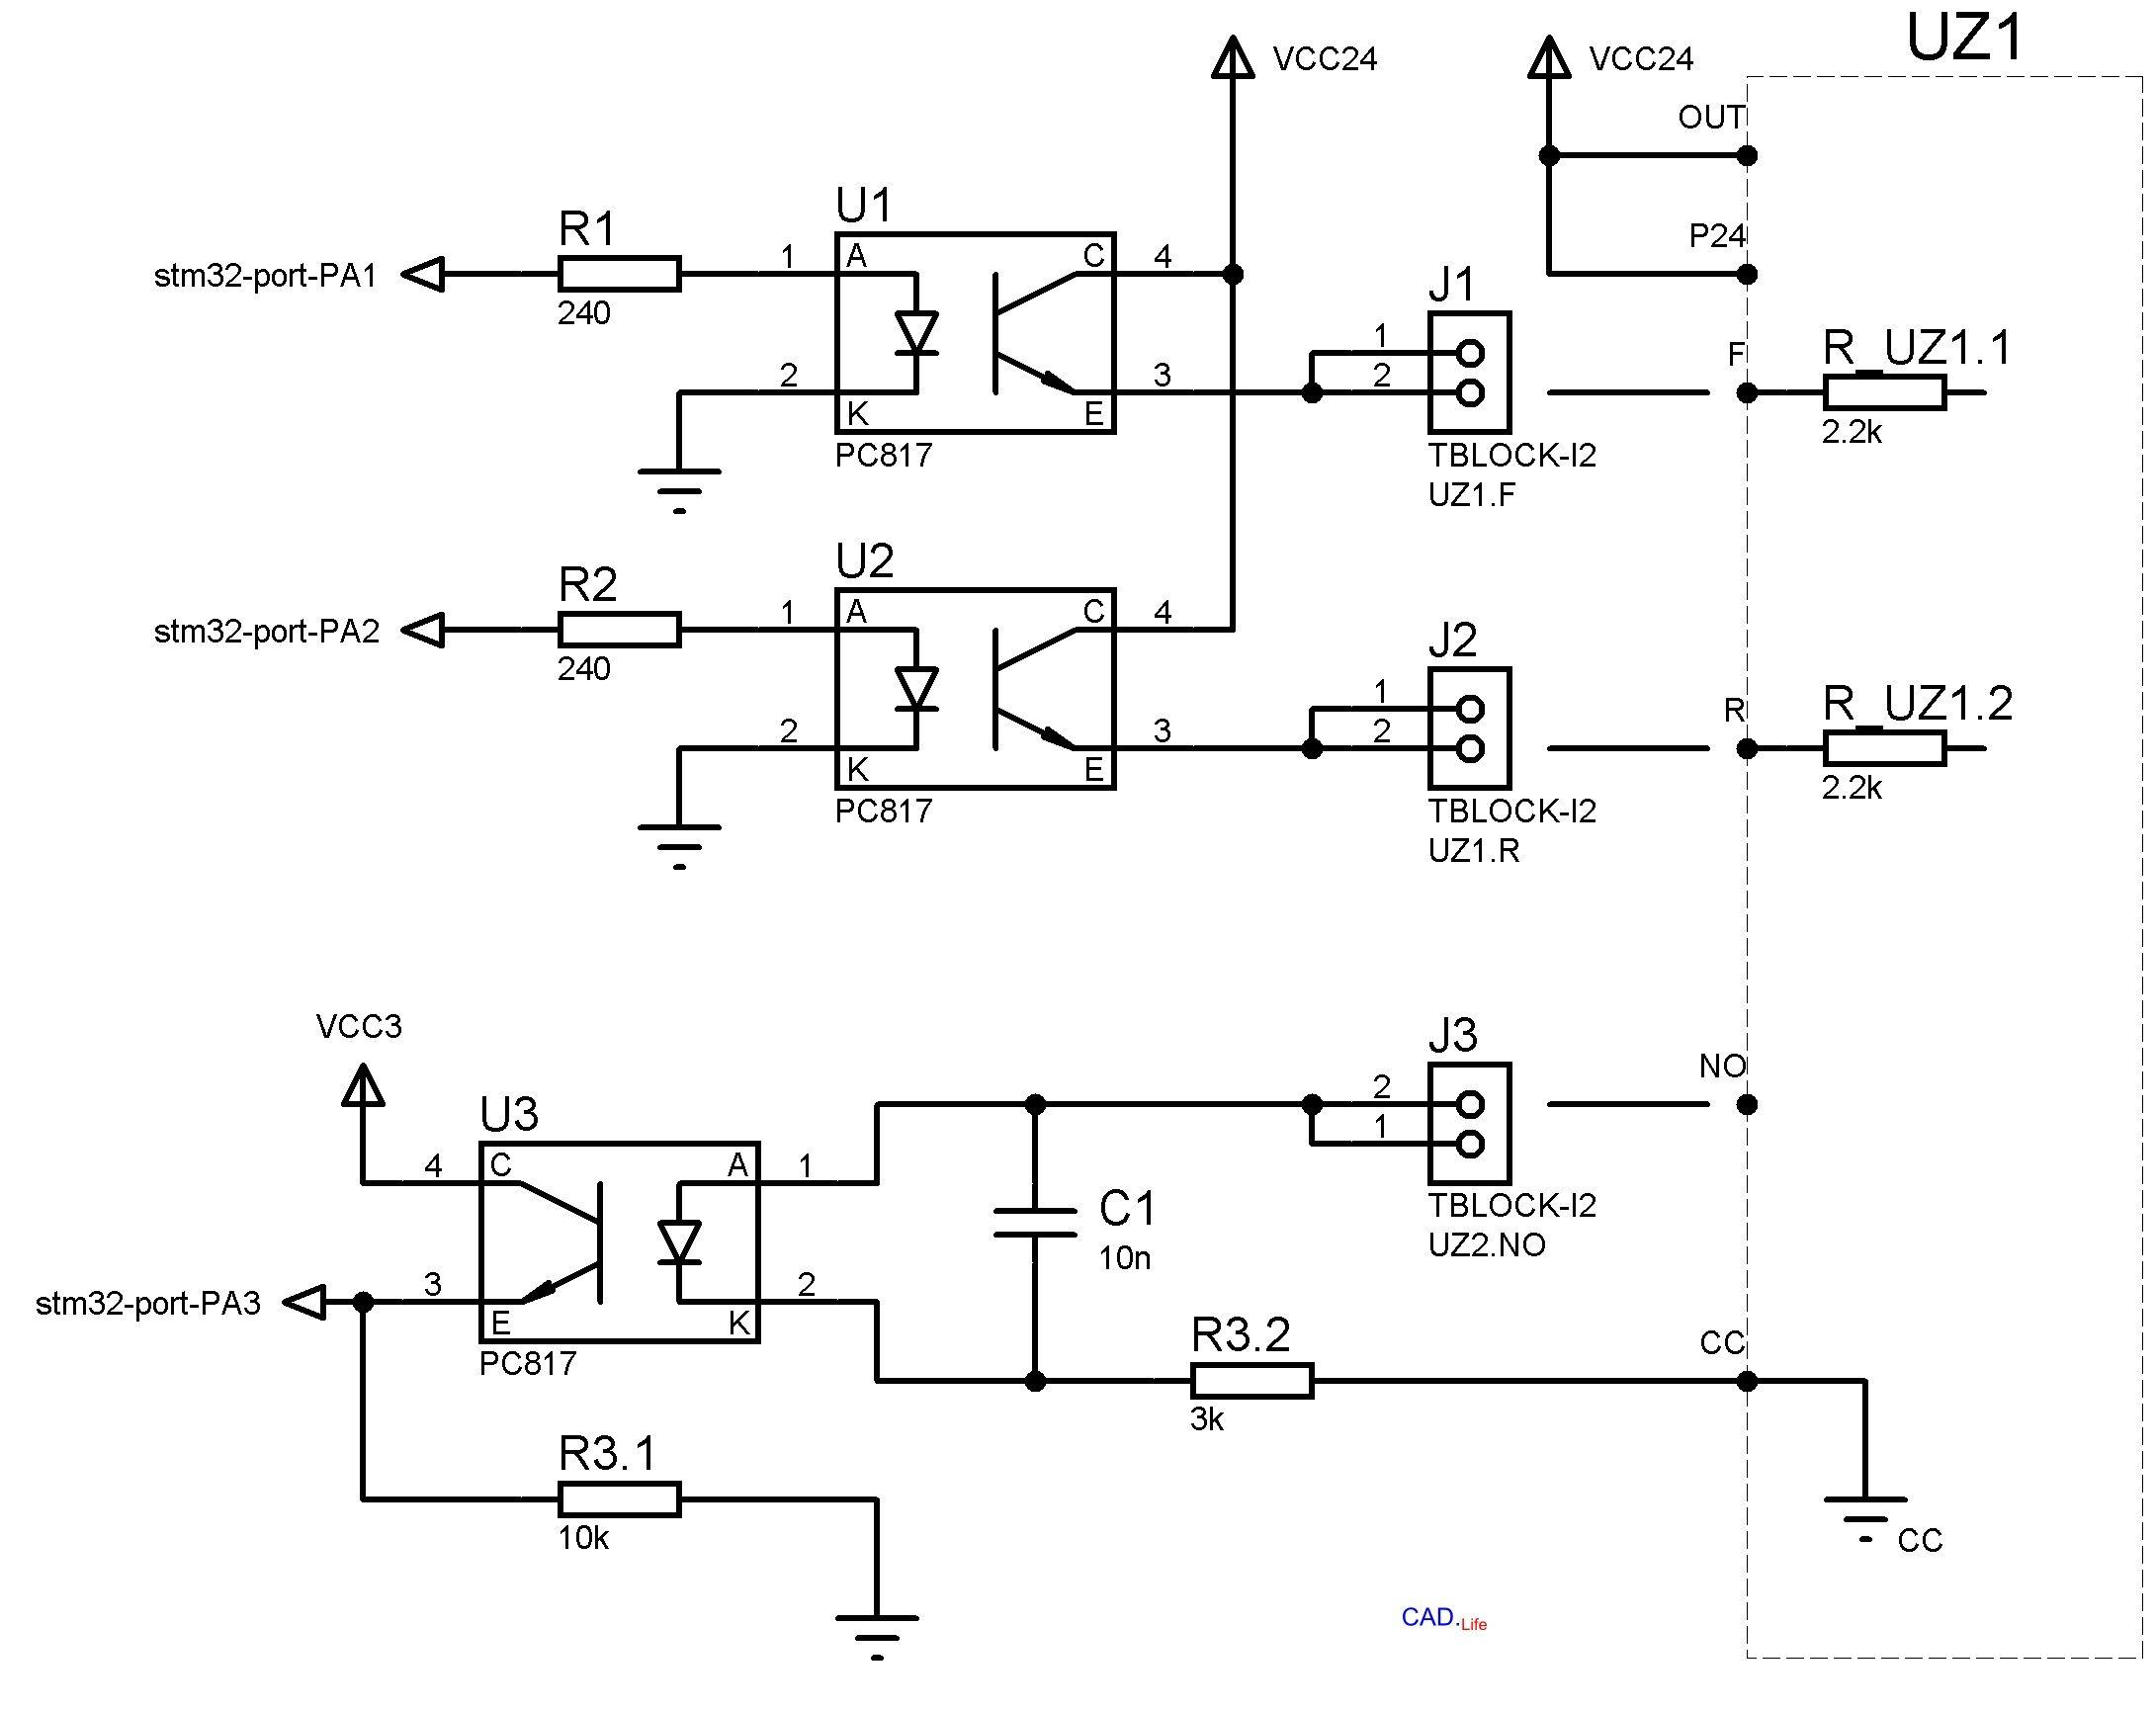 Рис.3. Не инвертирующая схема включения датчика через оптрон